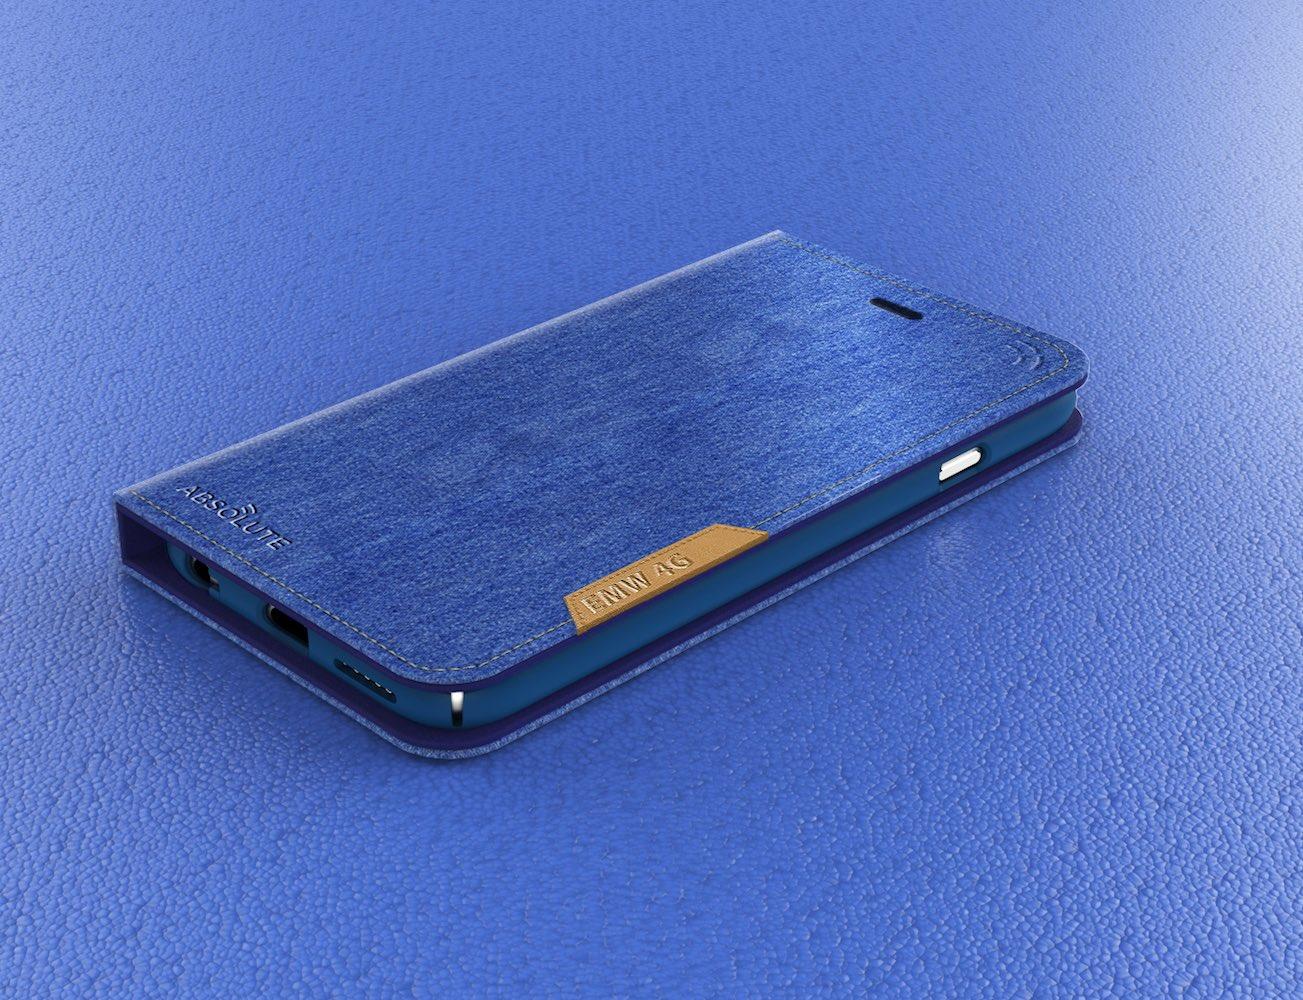 LINKBOOK PRO – LTE Signal Booster Case